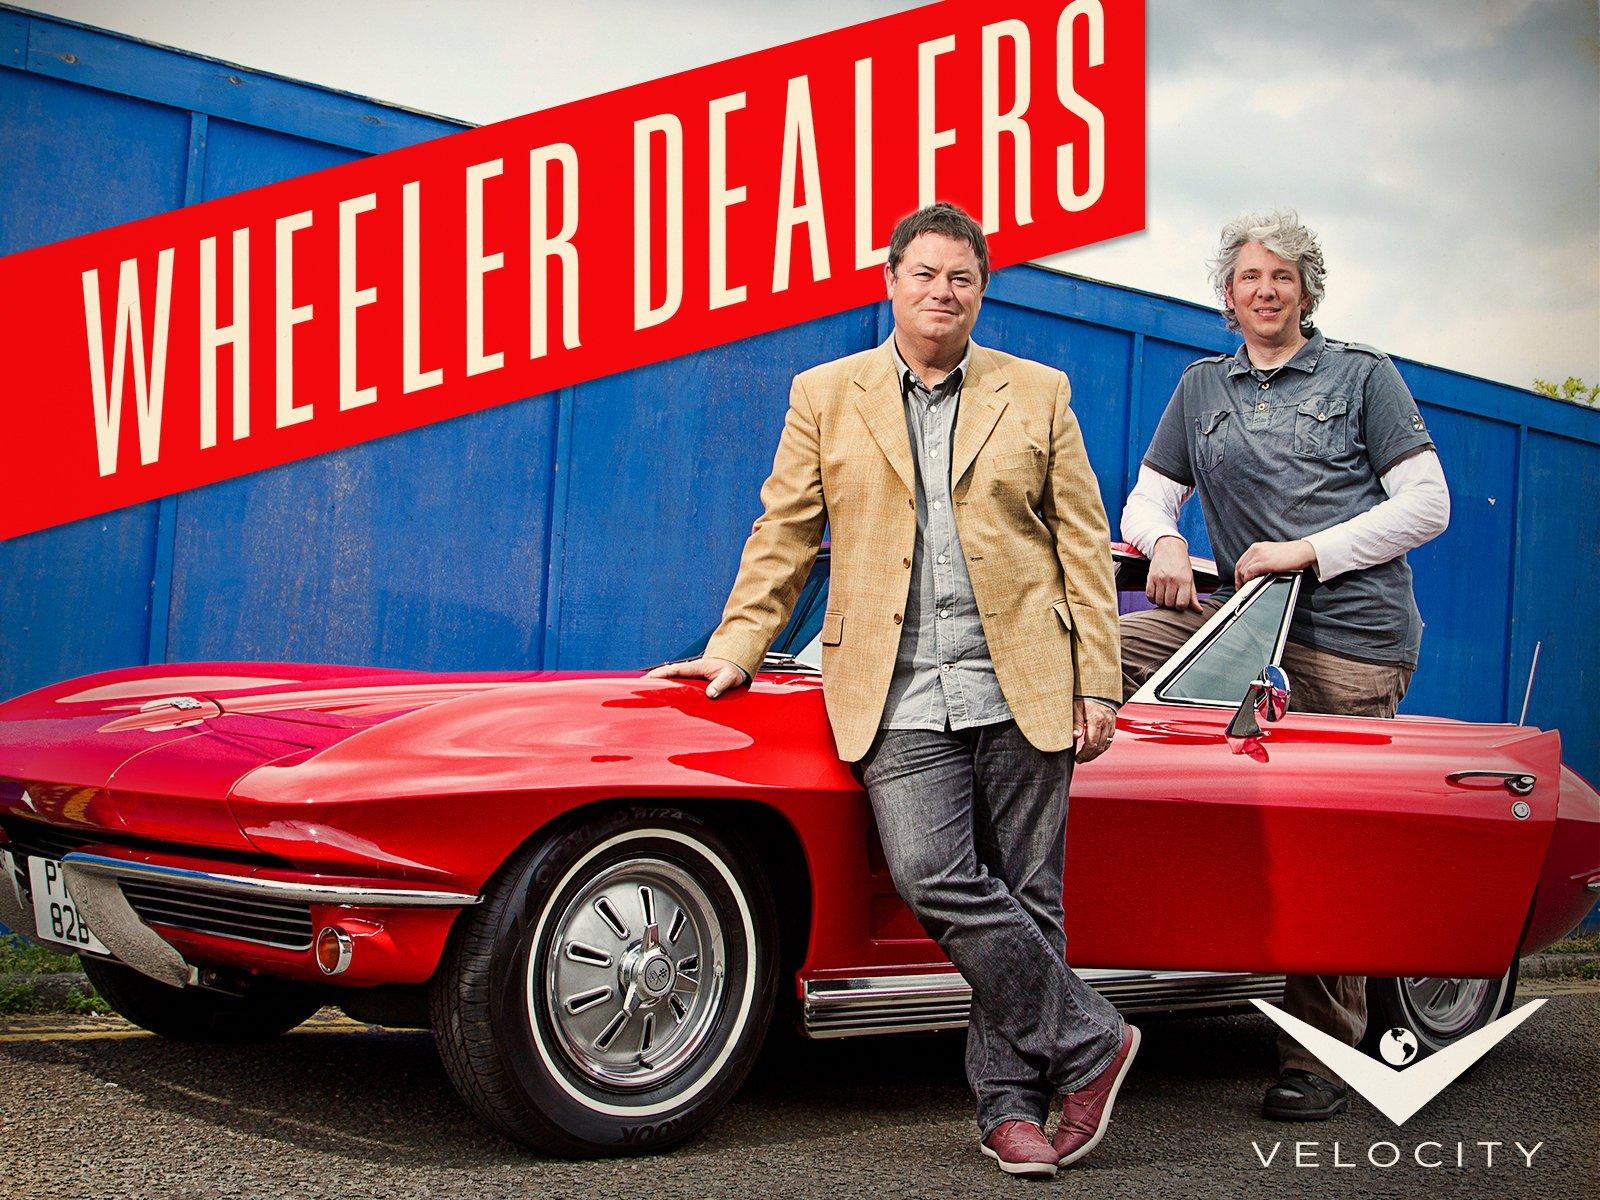 wheeler dealers season 10 episode 12